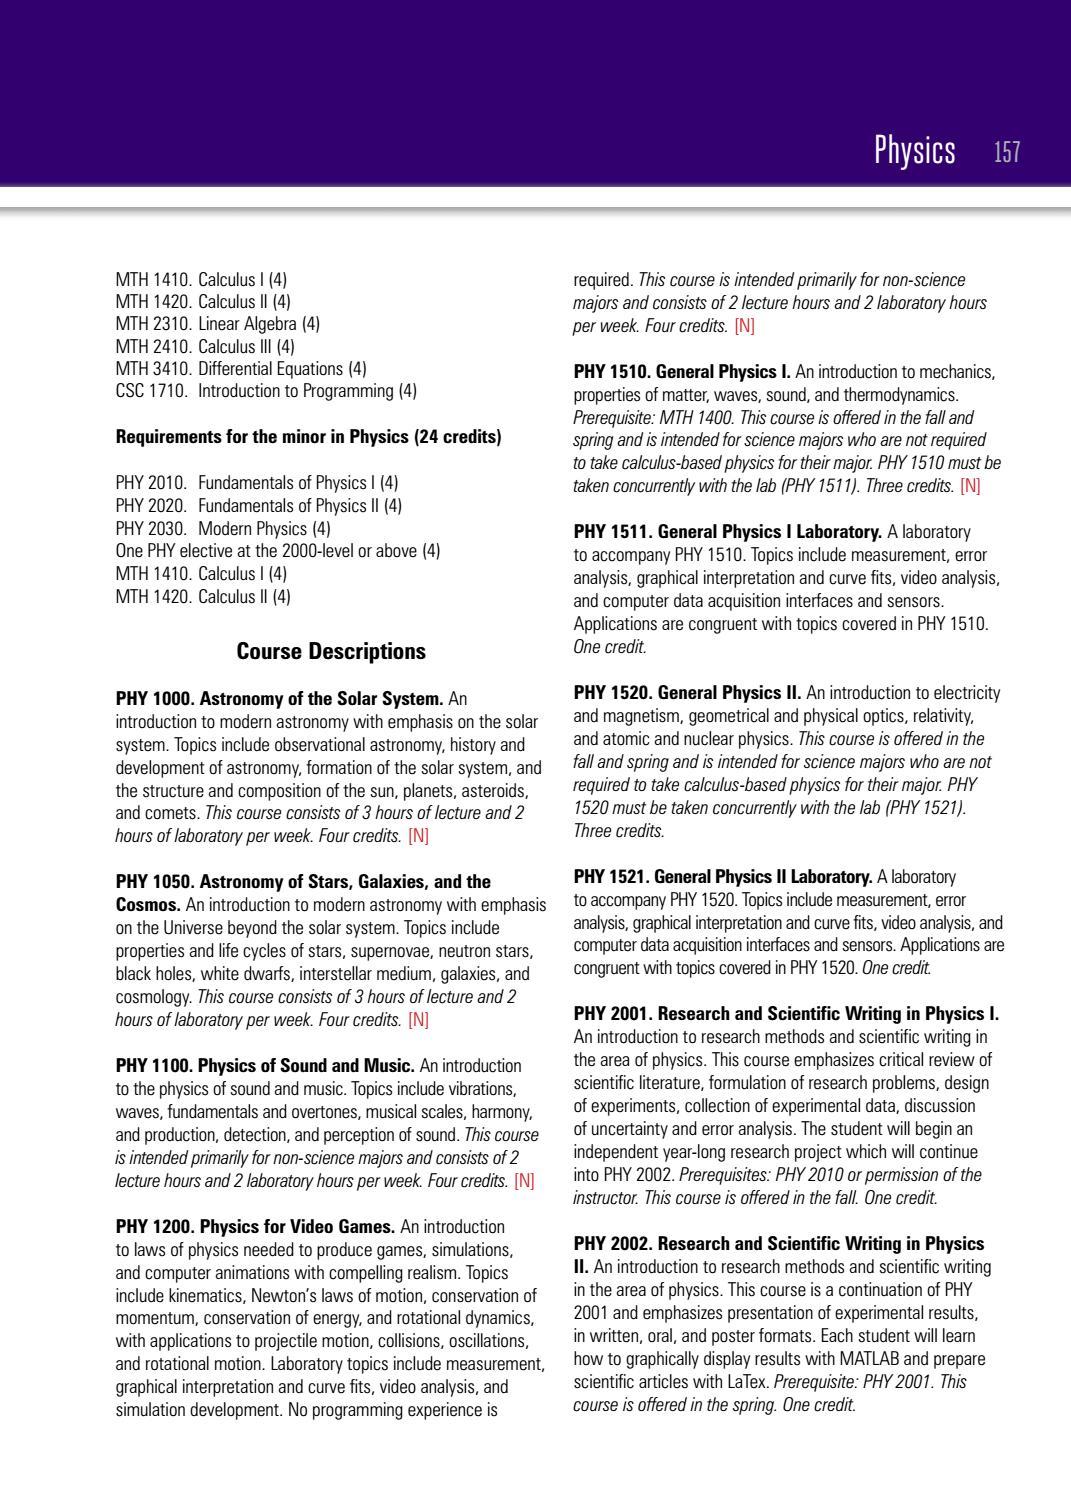 Undergraduate Bulletin 2016 2017 by High Point University